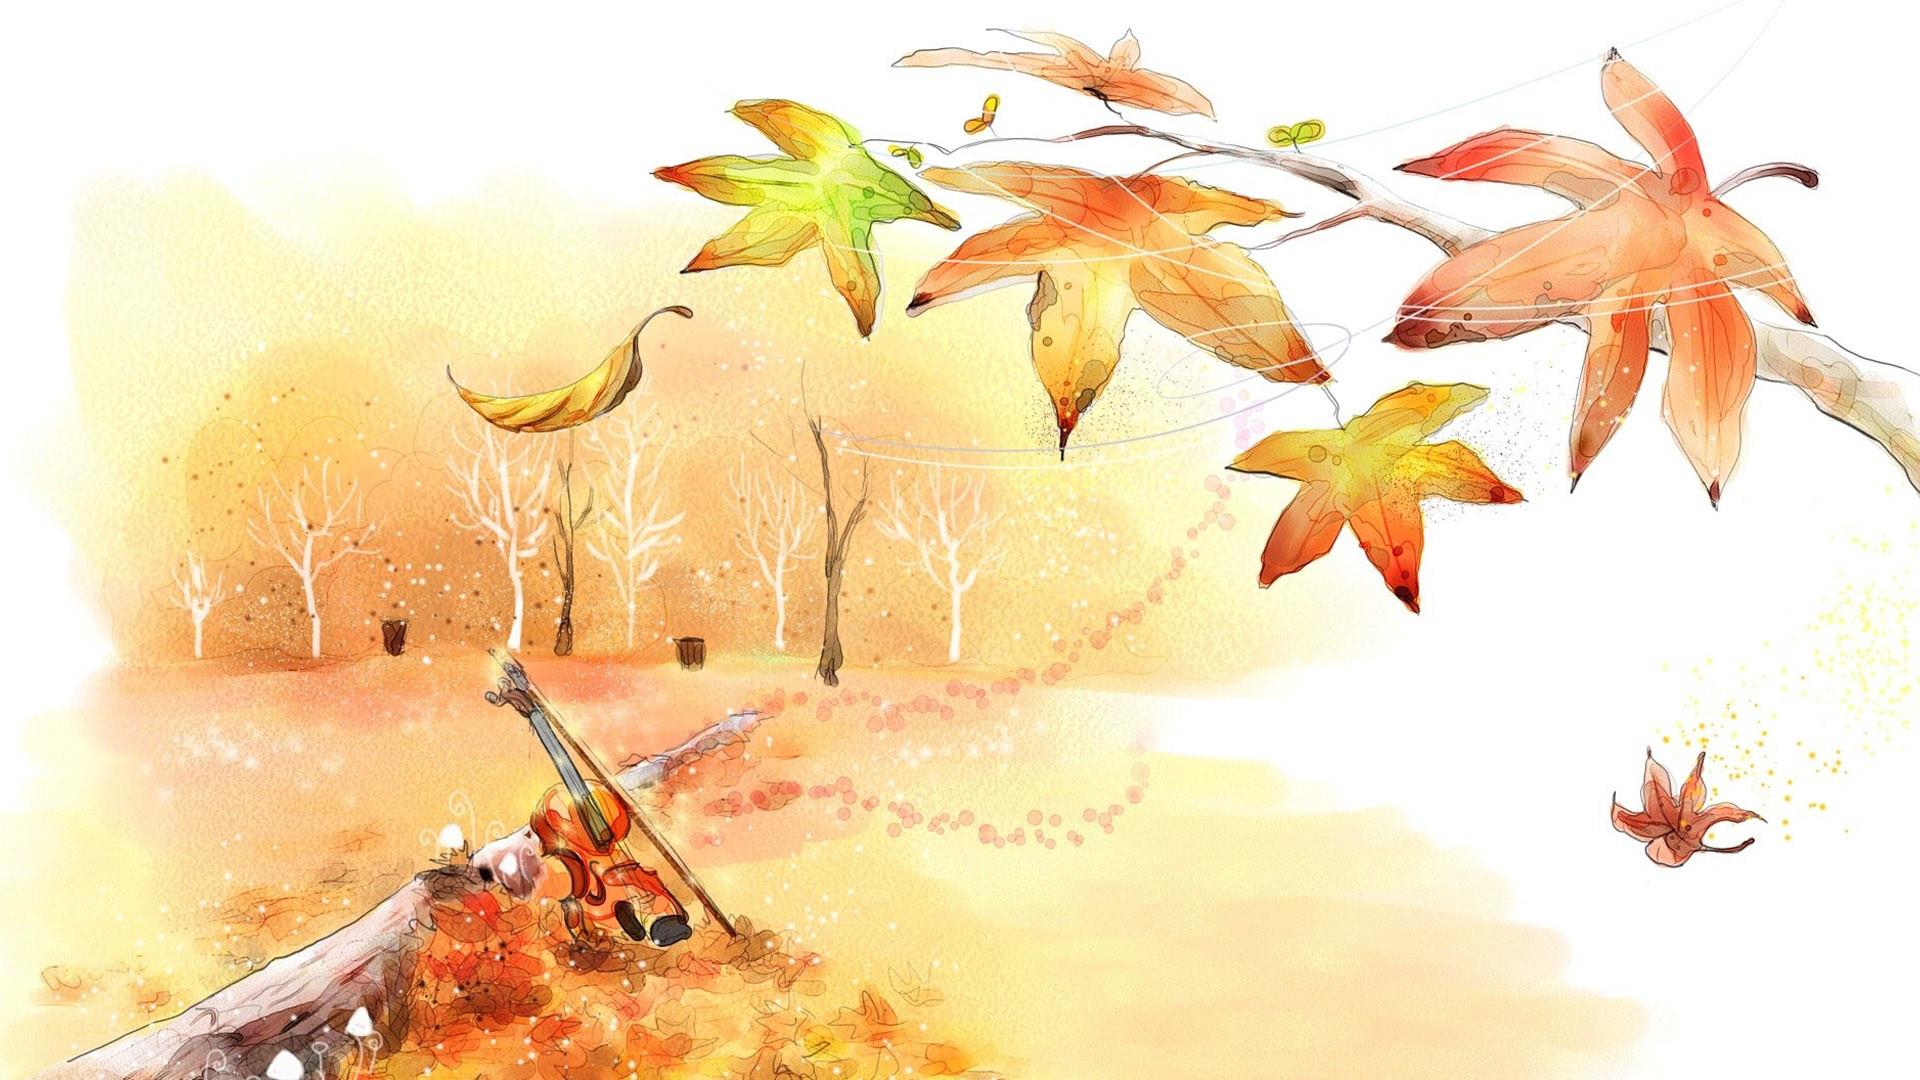 PreviousNext. Previous Image Next Image. autumn art wallpaper 239581